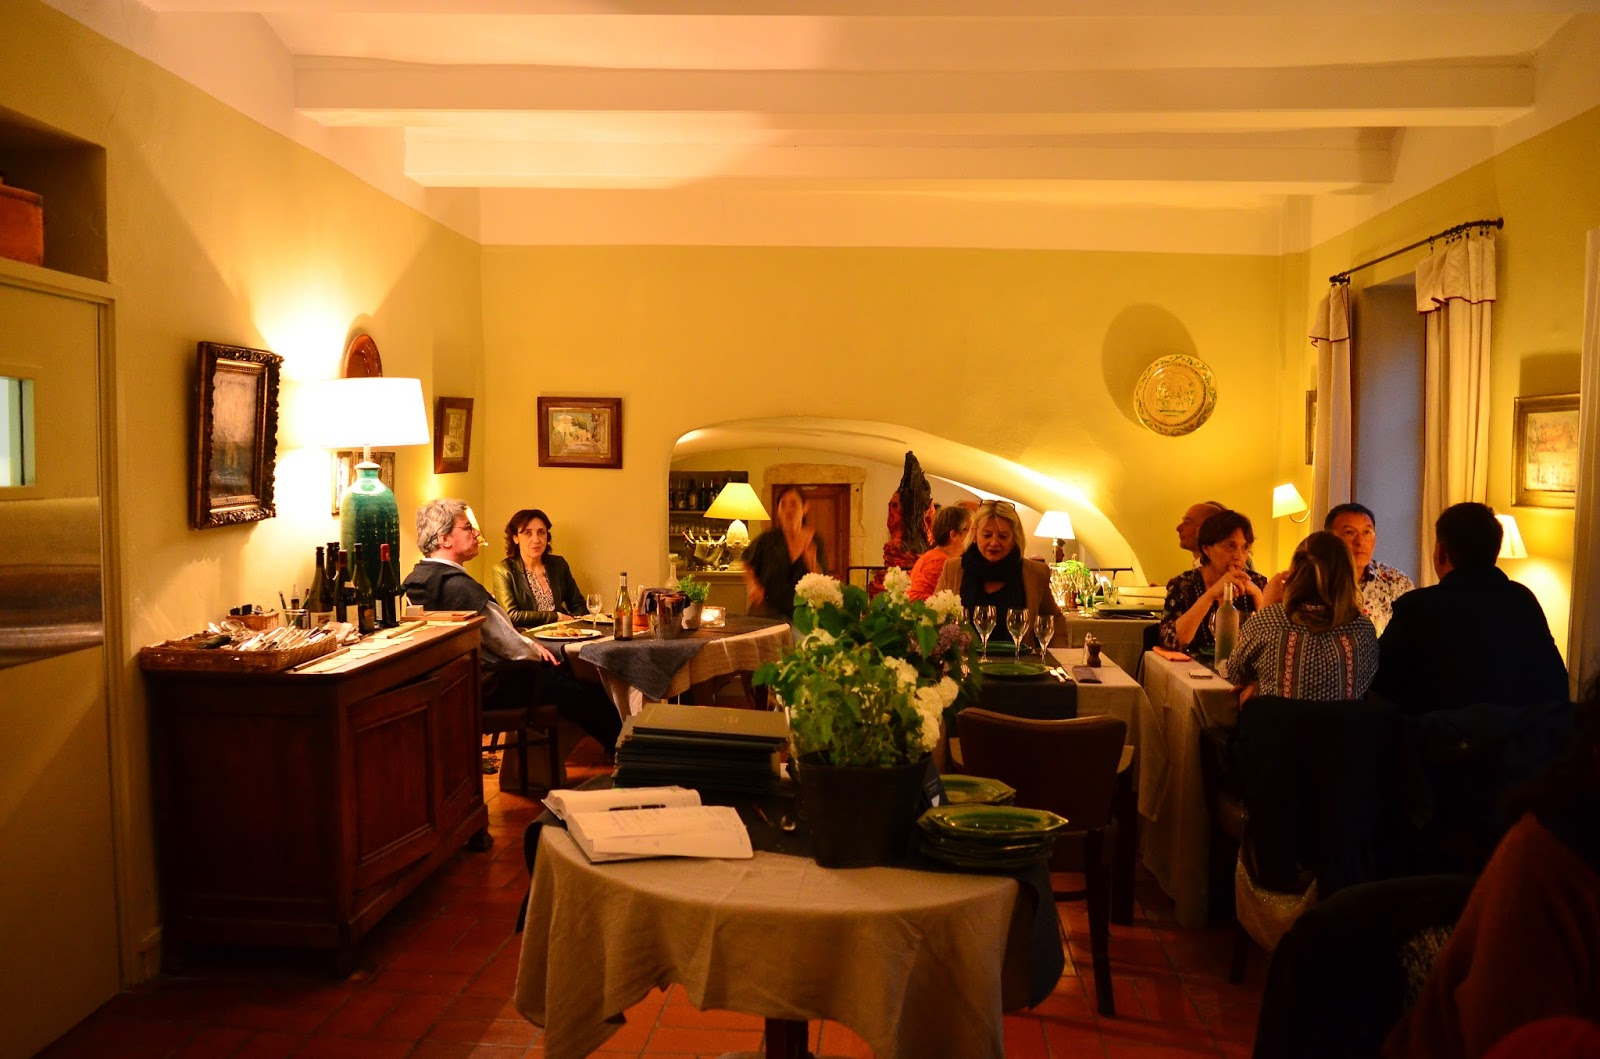 Hedofoodia la treille muscate cliousclat - Restaurant cliousclat la treille muscate ...